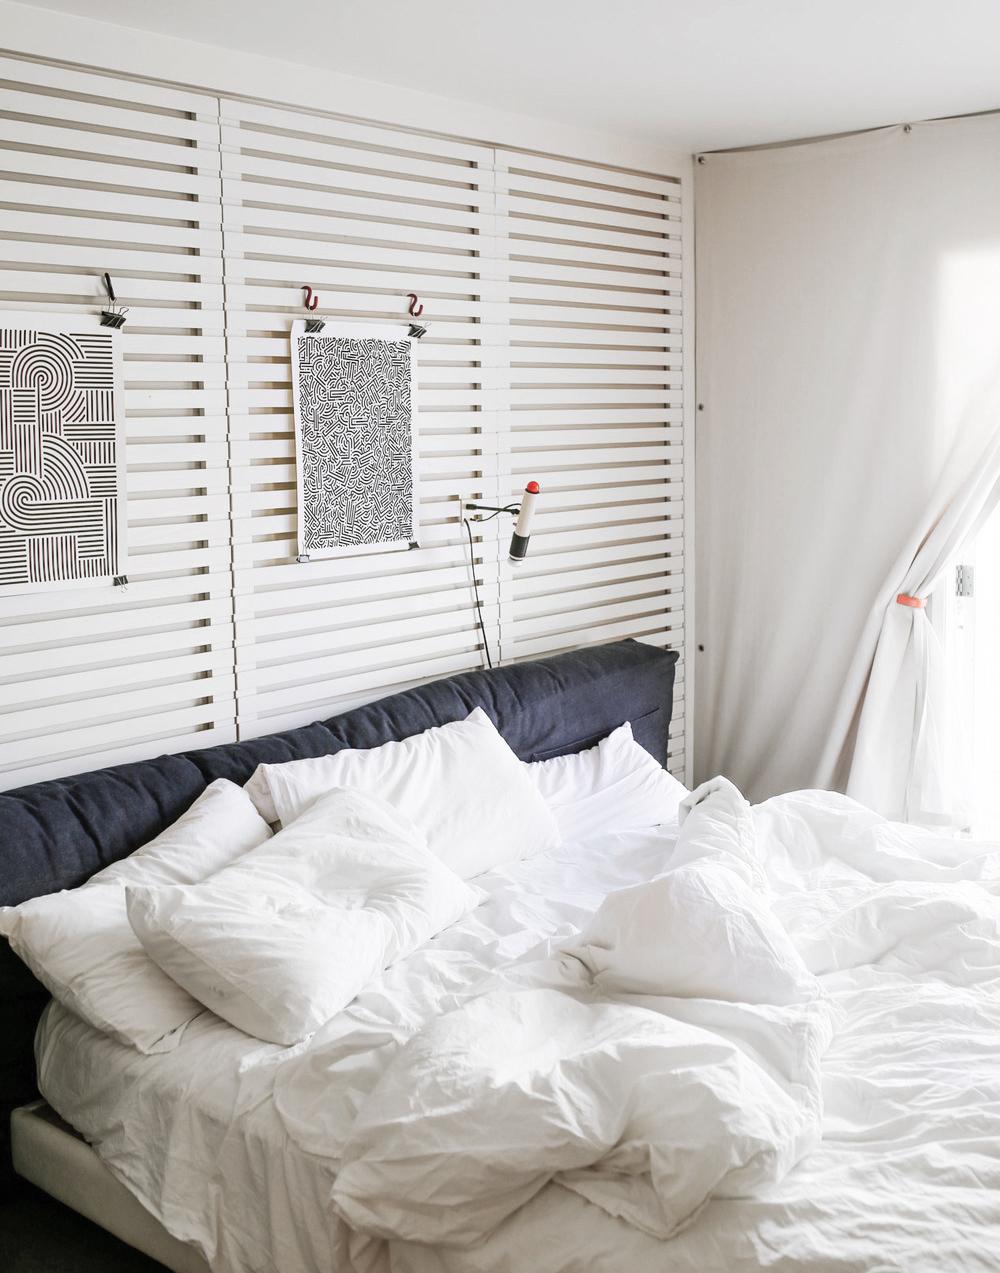 wearemad-ace-hotel-rooms.jpg